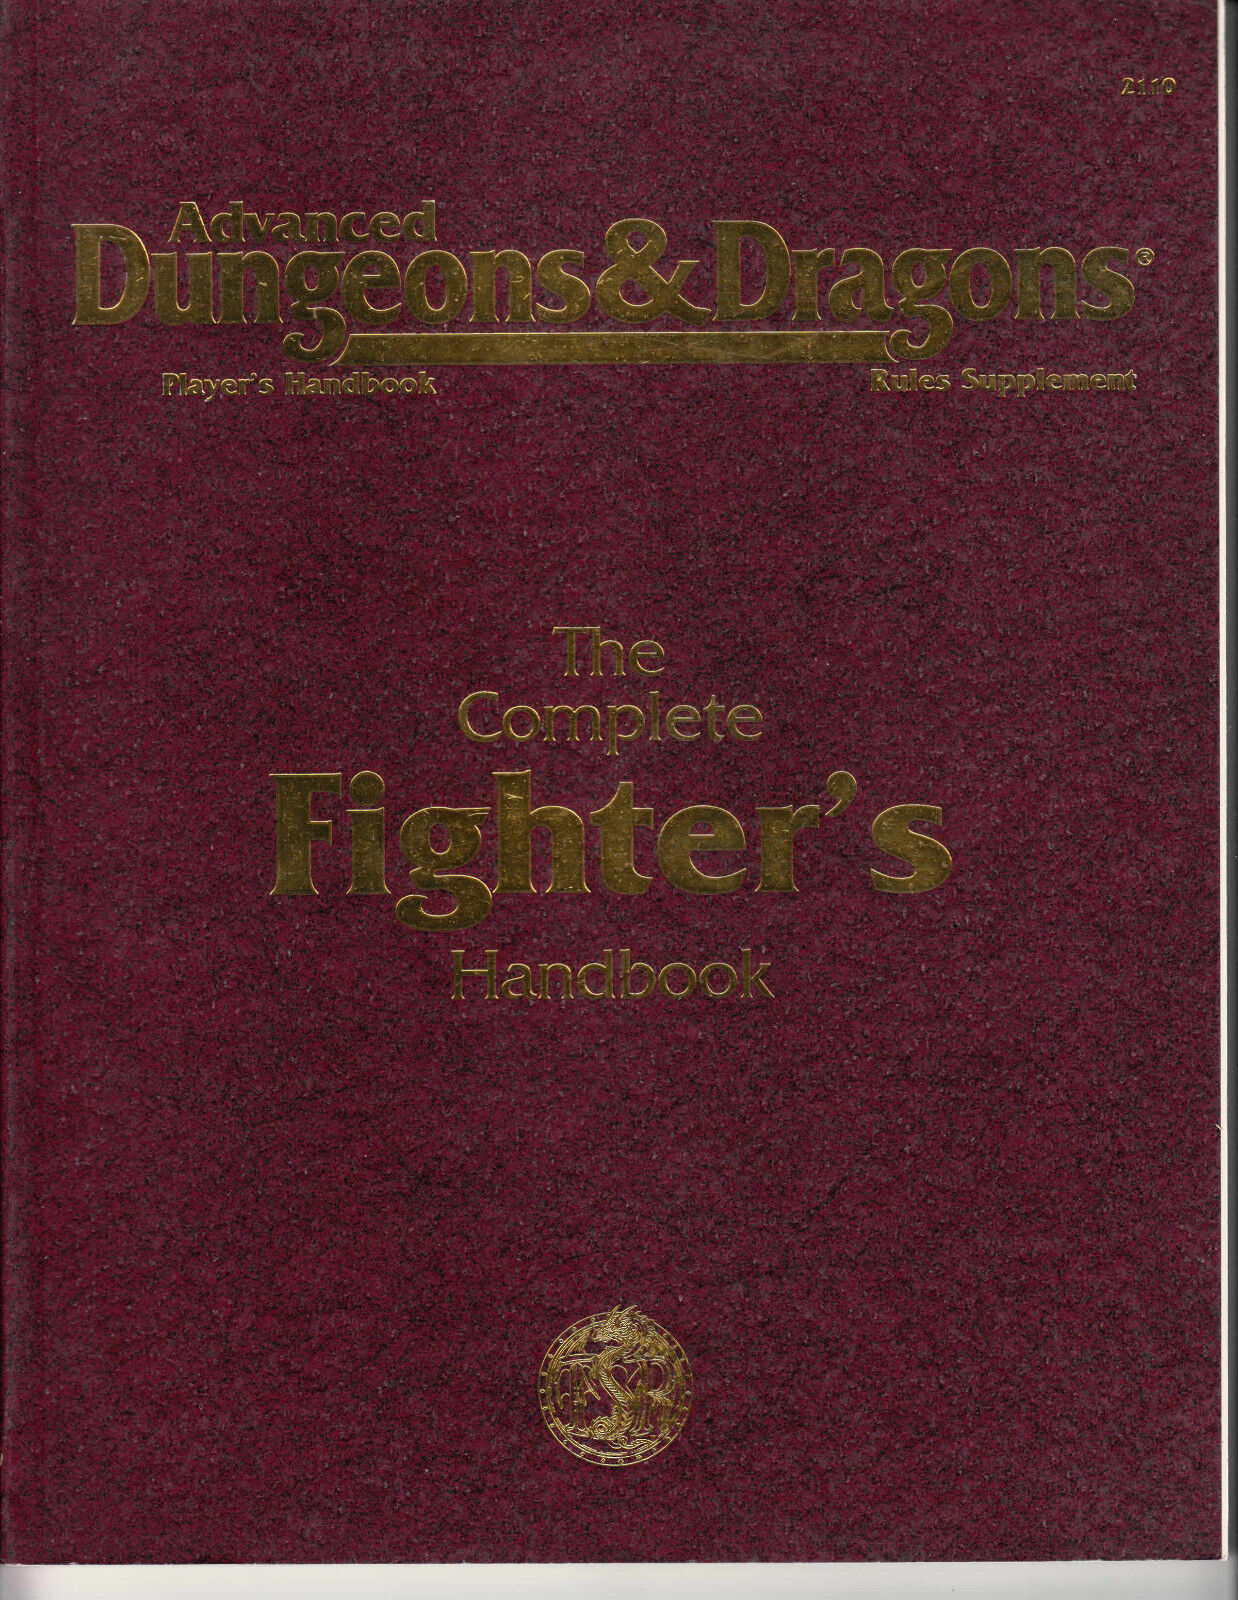 AD&D - The Complete Fighter's Handbook - NEW ENG ENG ENG TSR 2110 Supplement f62442